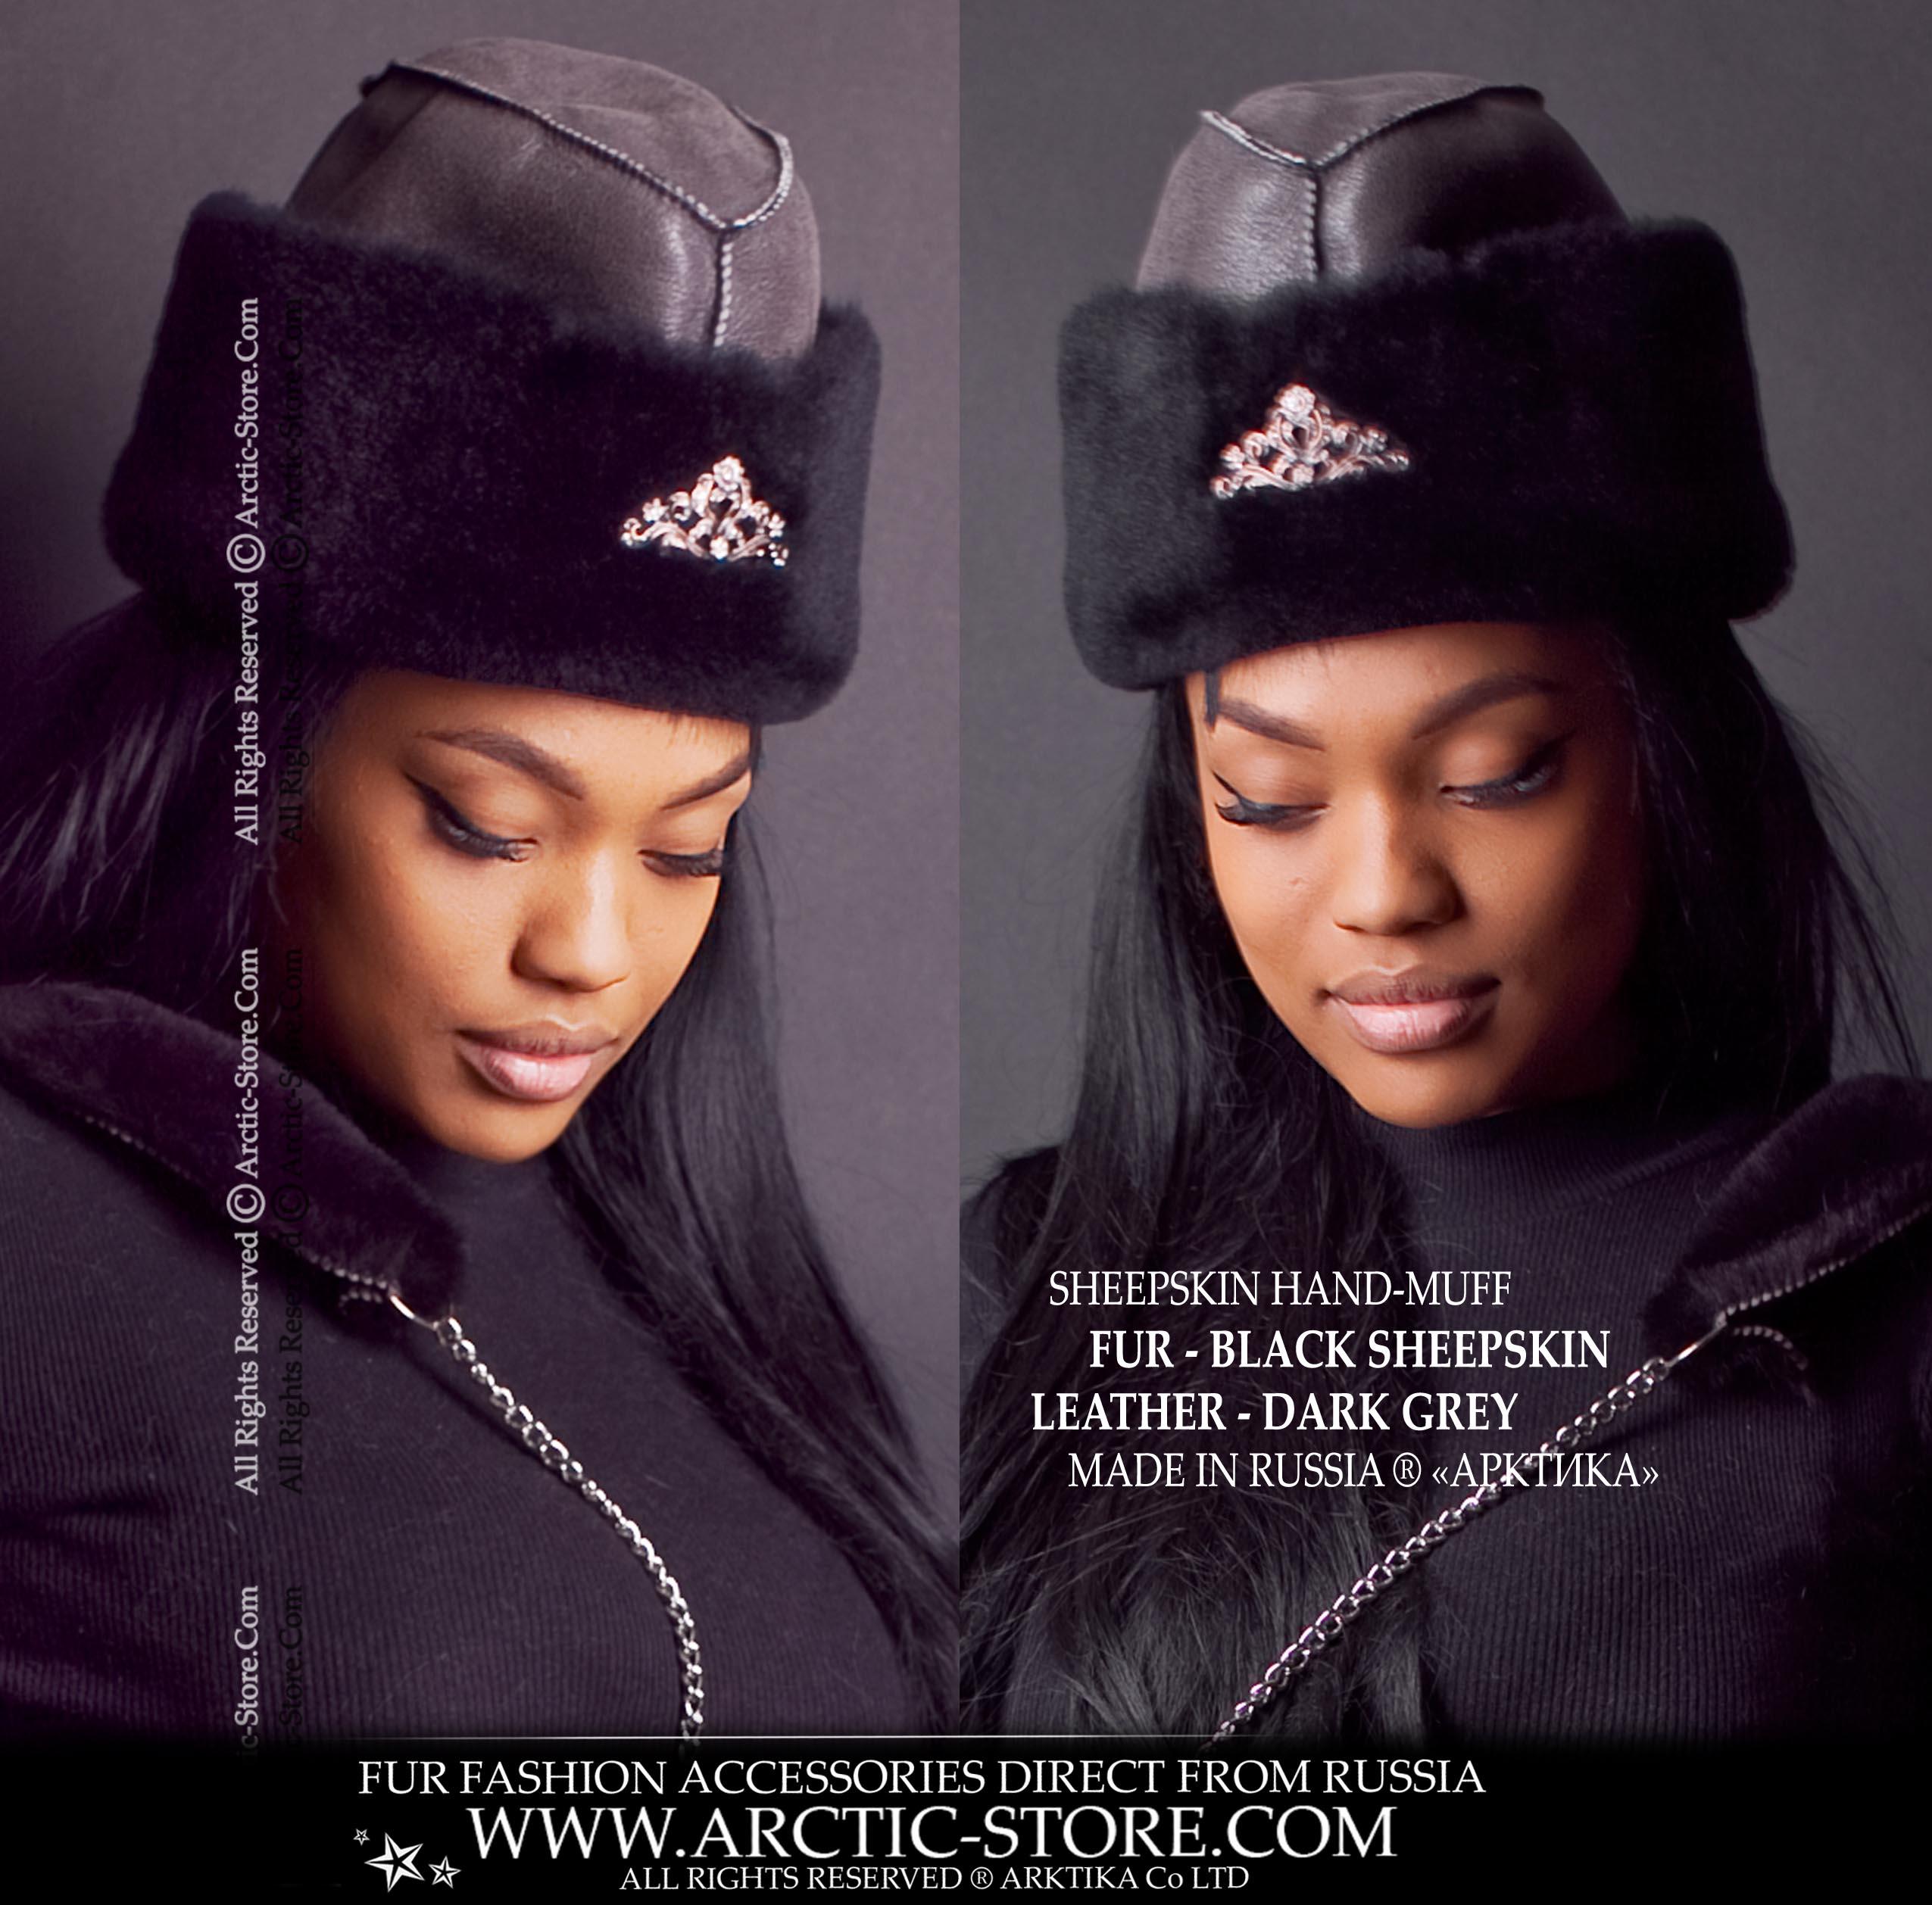 588c7f3f186 Sheepskin grey fur hat - ambassador style women s hat